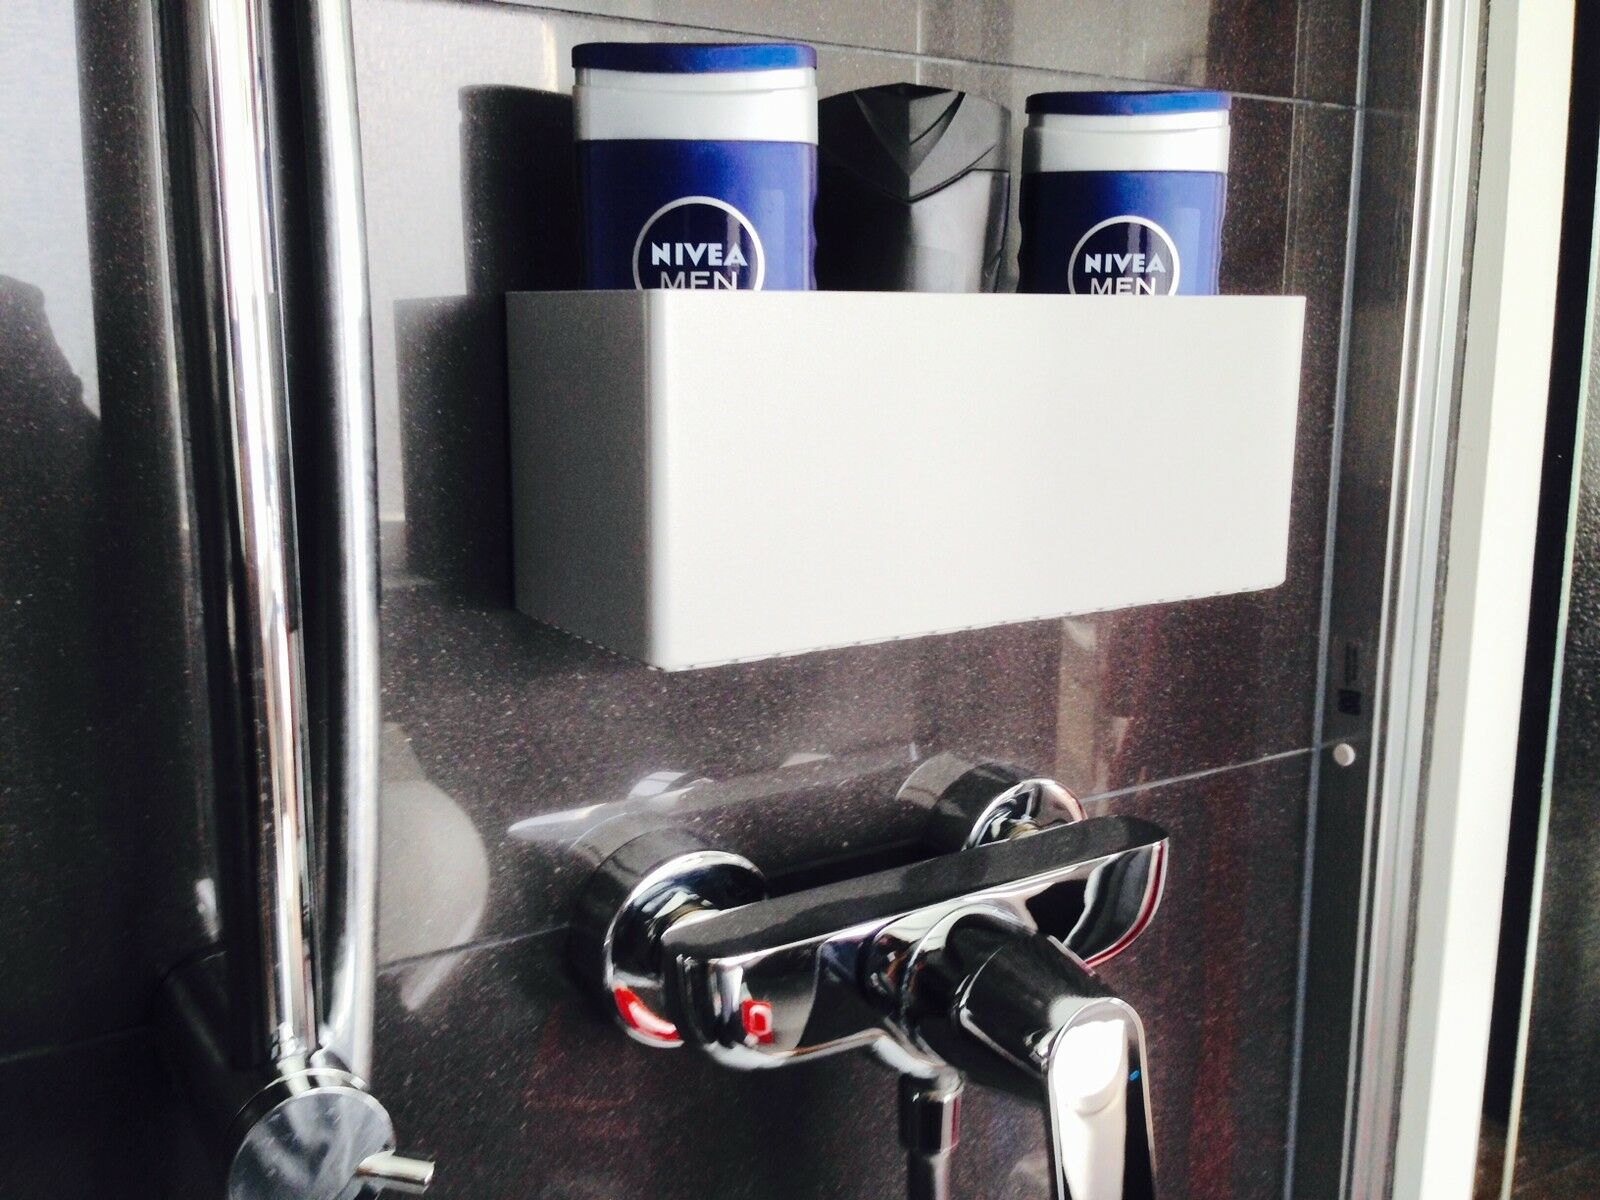 duschregal silber loft design seifen shampoo regal bad dusche wc ohne bohren eur 49 90. Black Bedroom Furniture Sets. Home Design Ideas